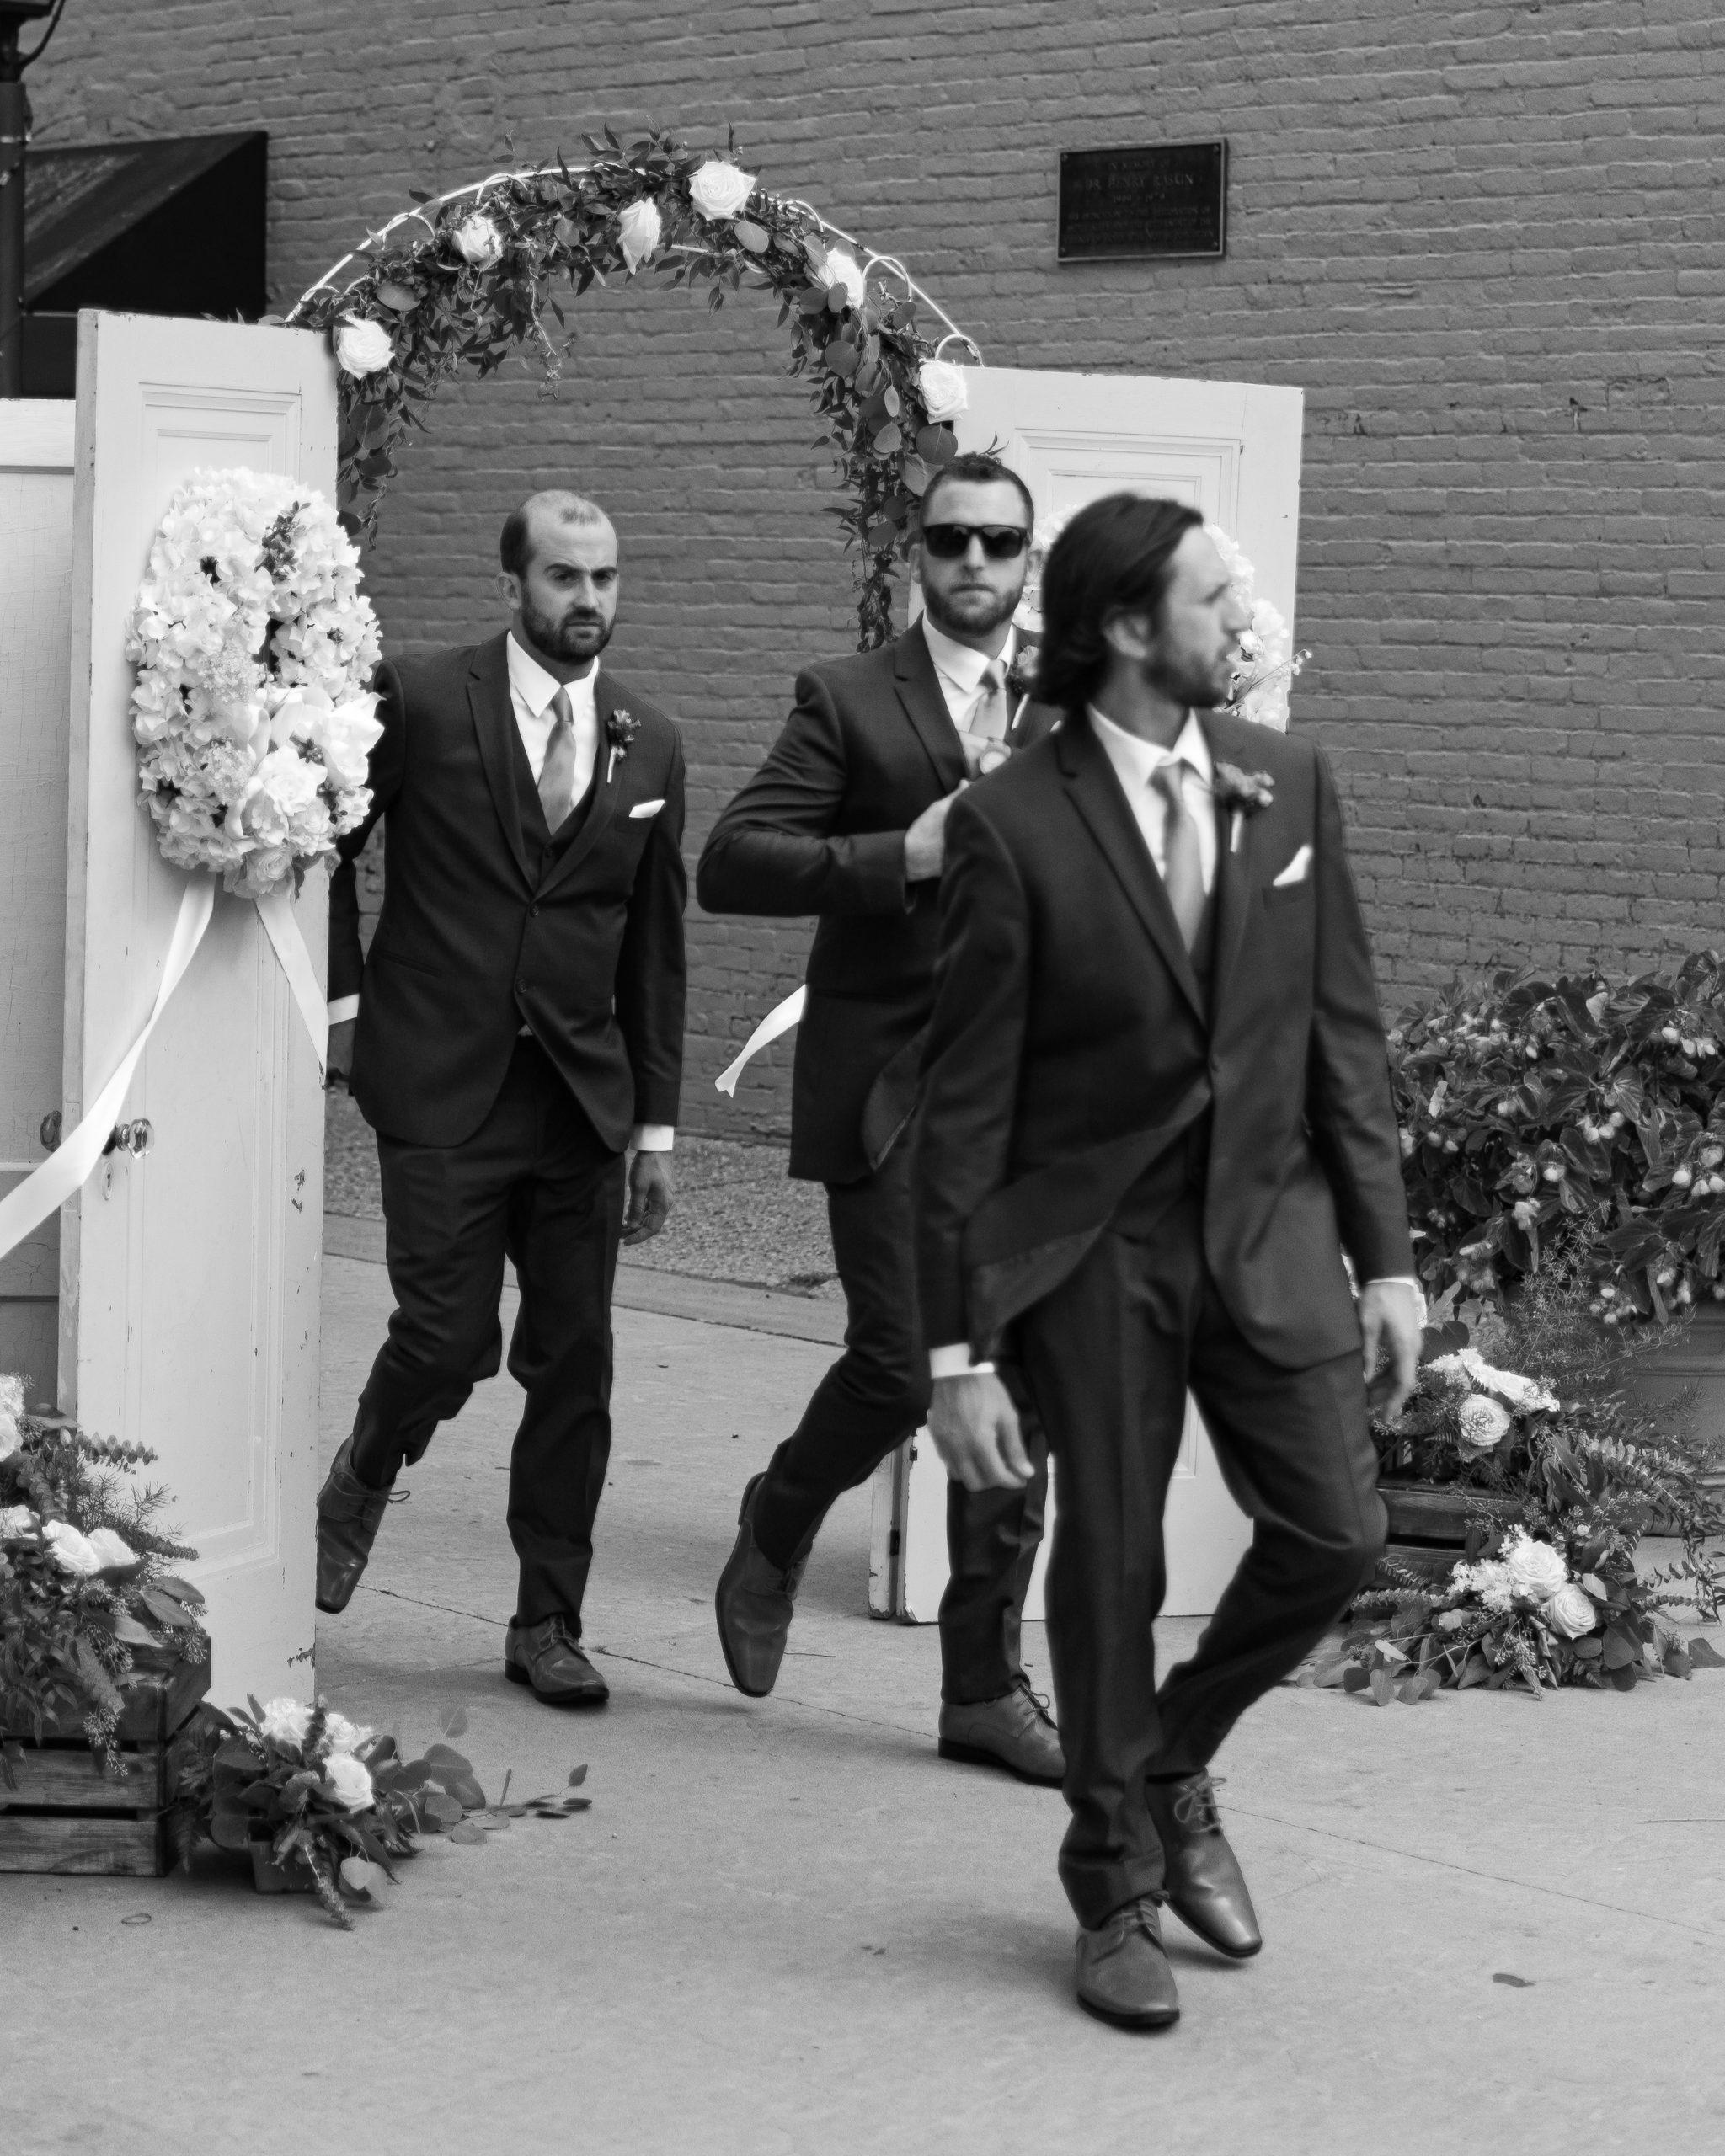 Three groomsmen in Holly for a wedding